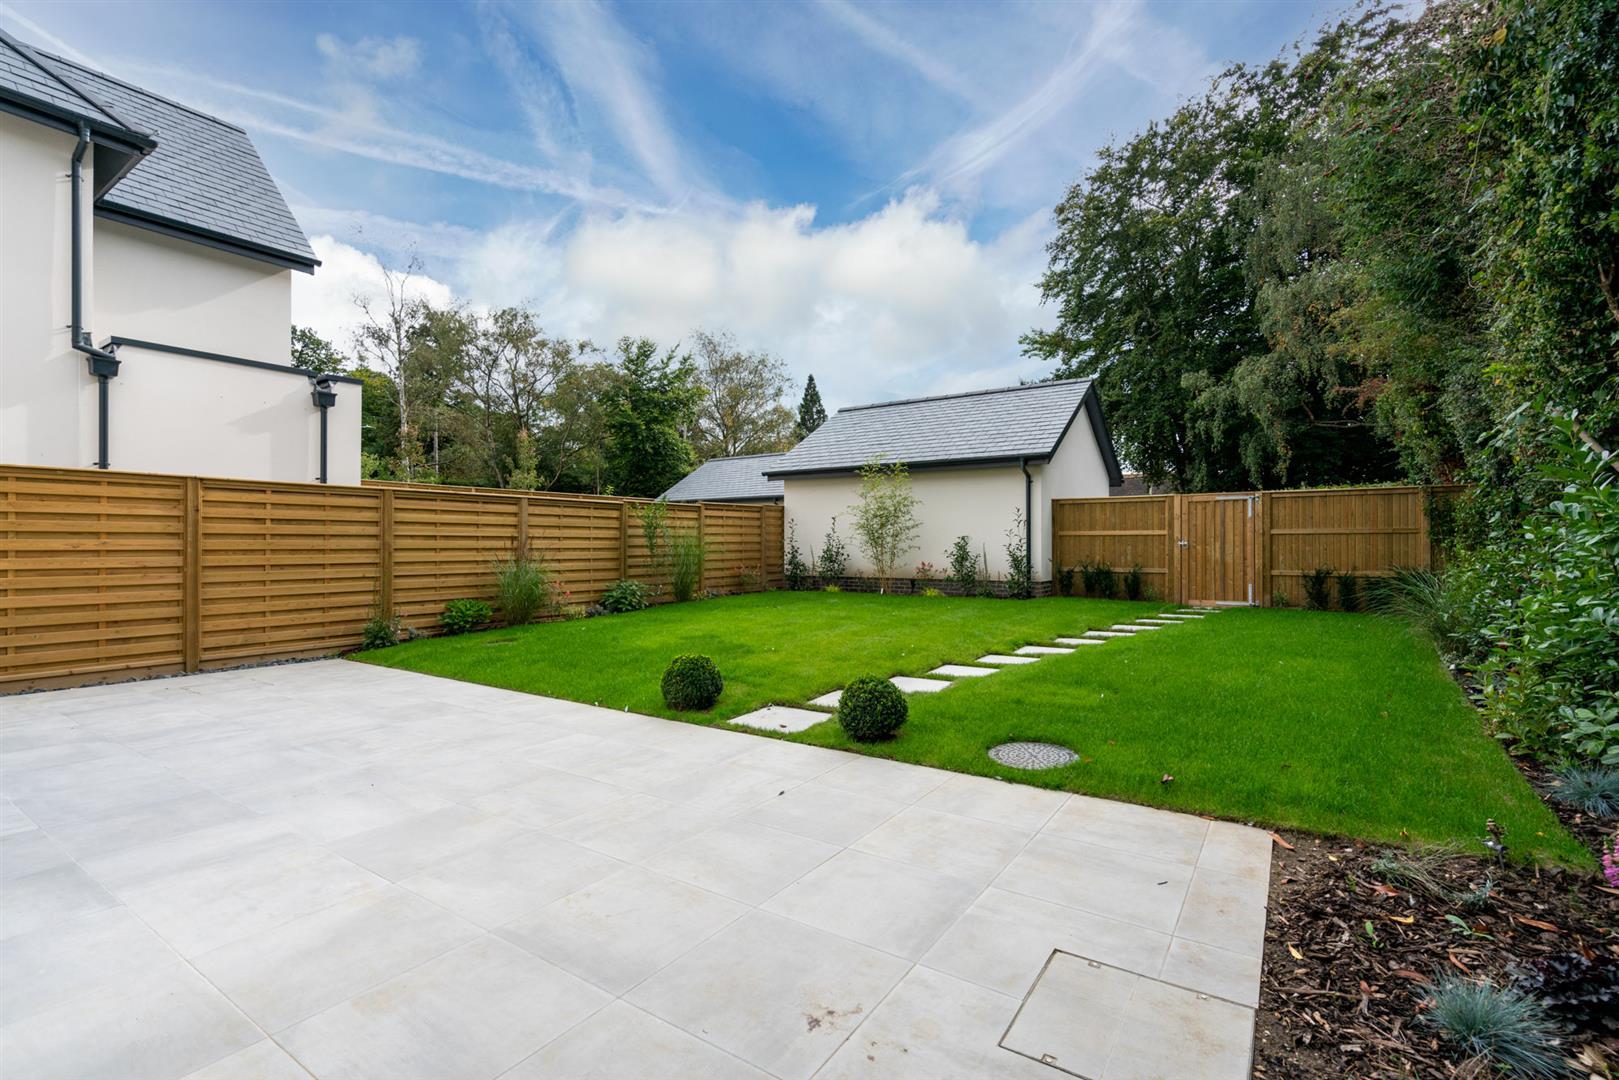 Bramley-5 - patio garden view.jpg